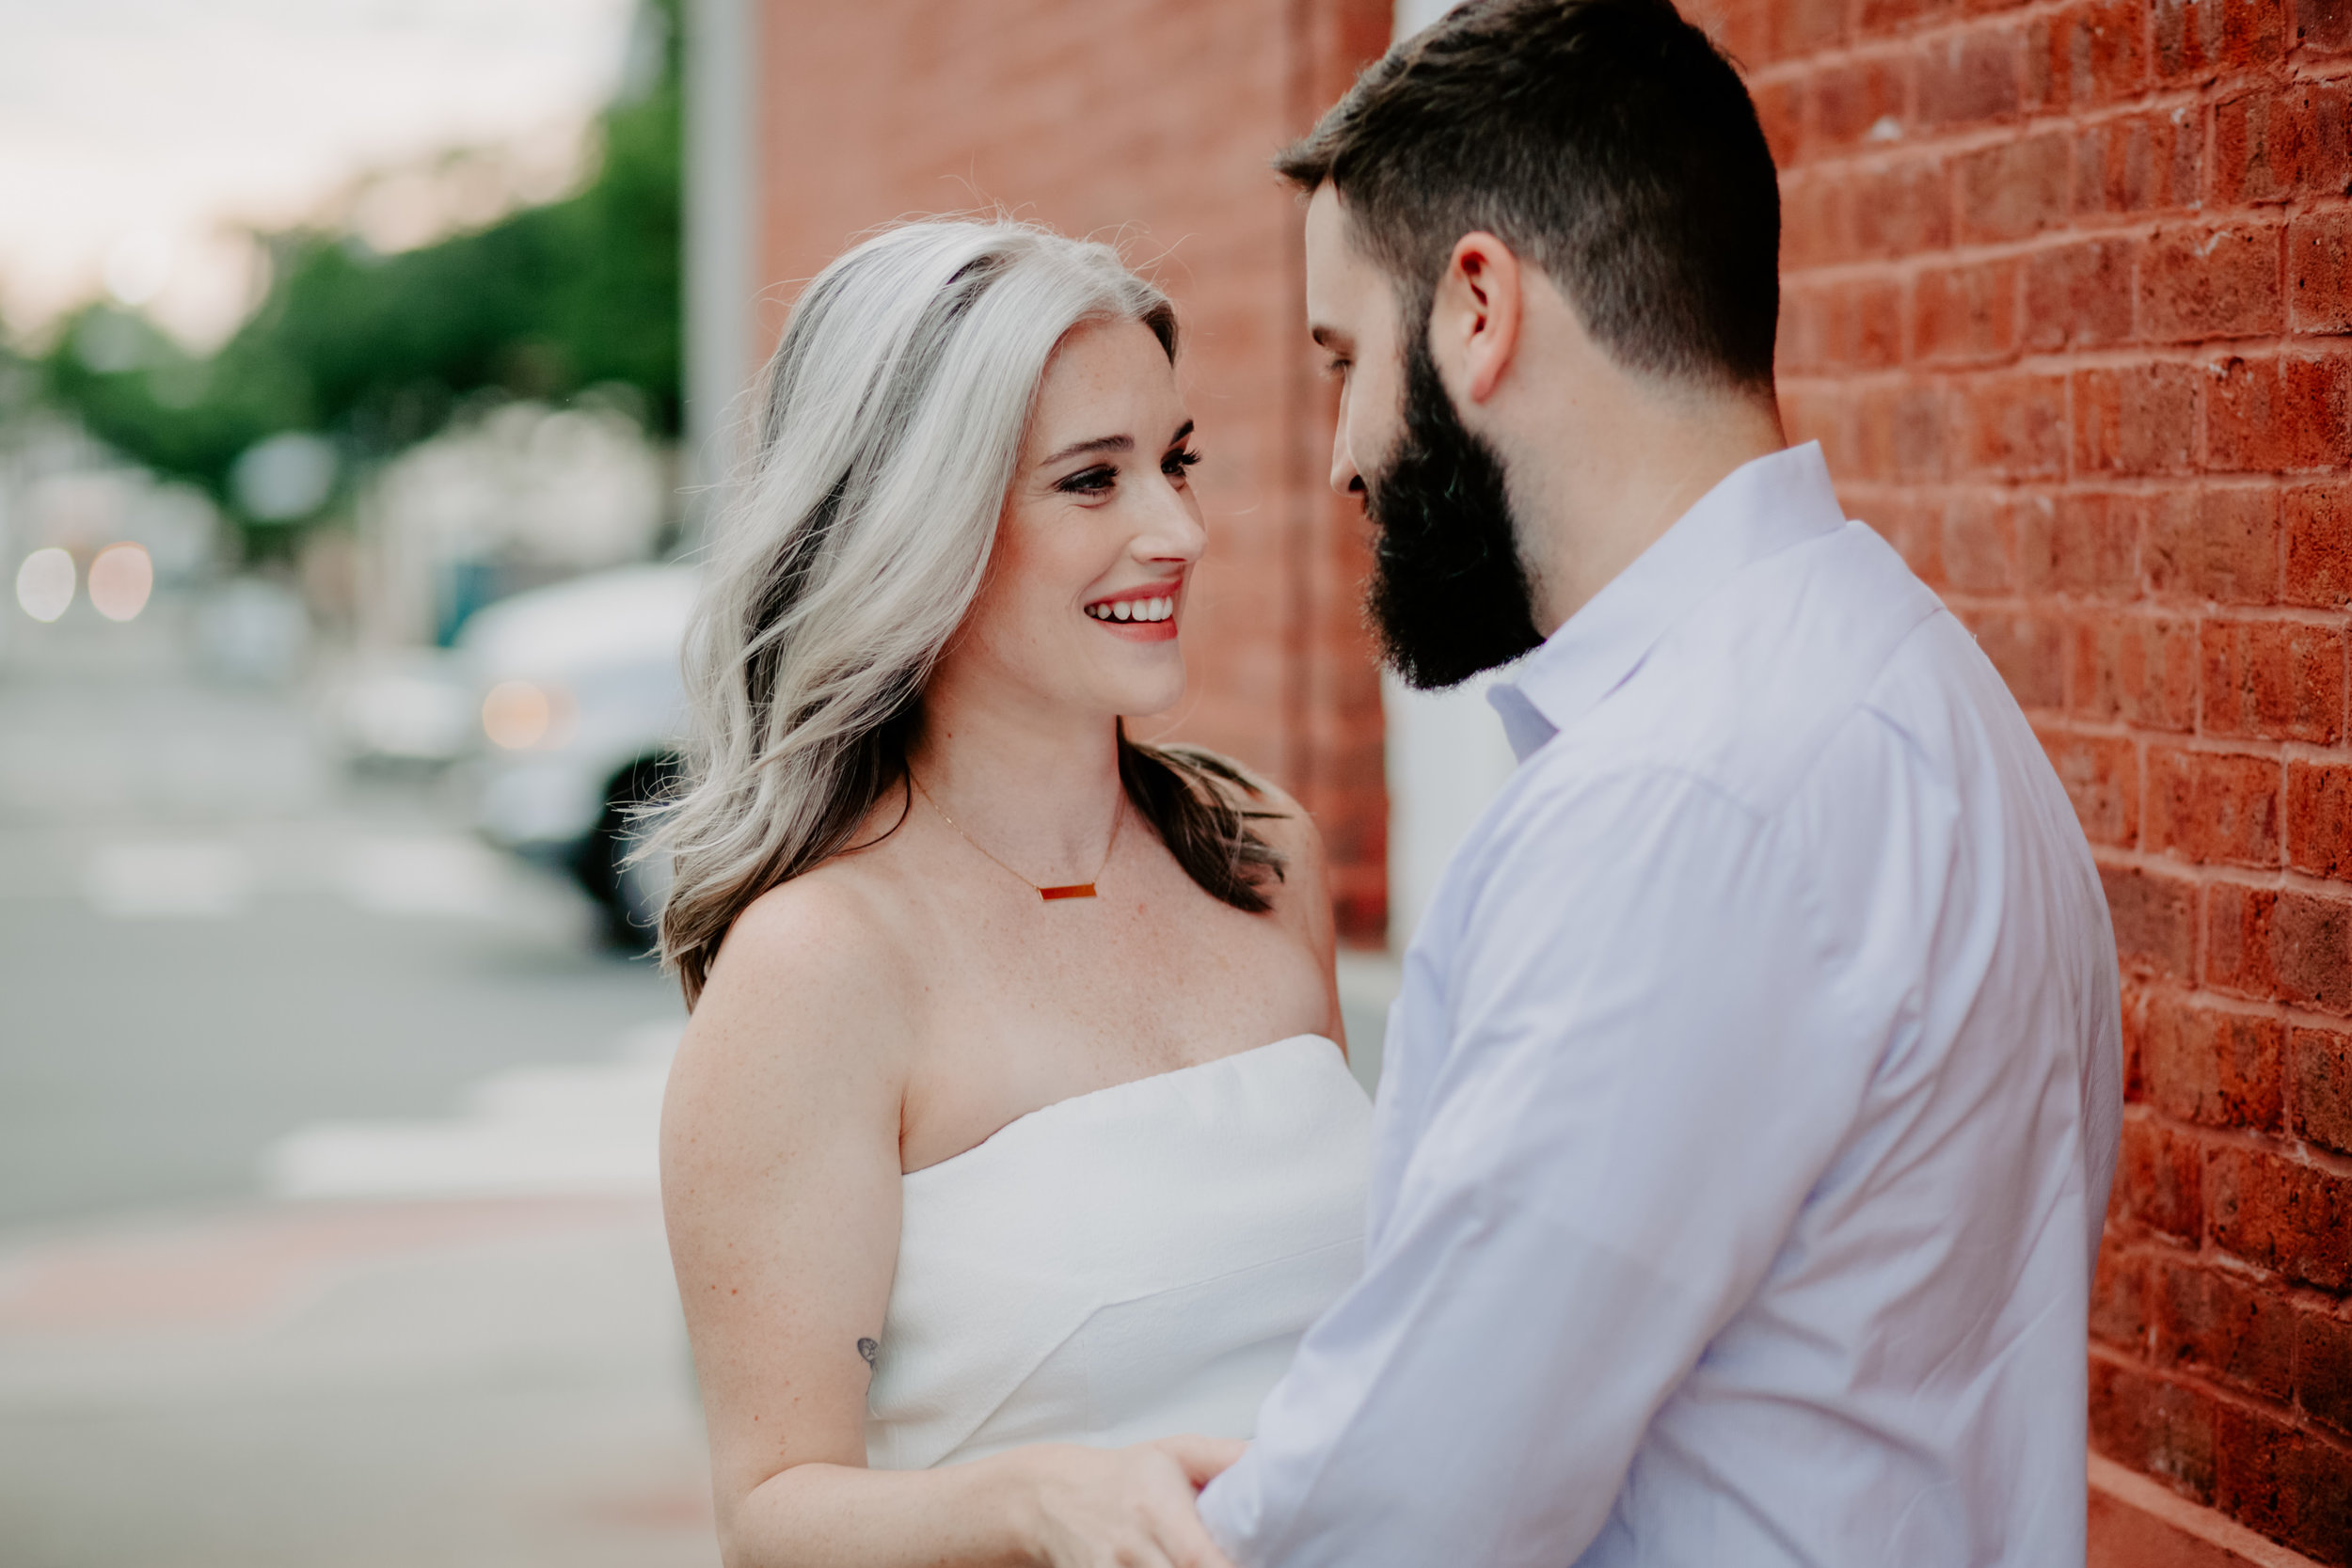 KateMax_JerseyCity_Lofi_Wedding_TowardsTheMoon-9.jpg